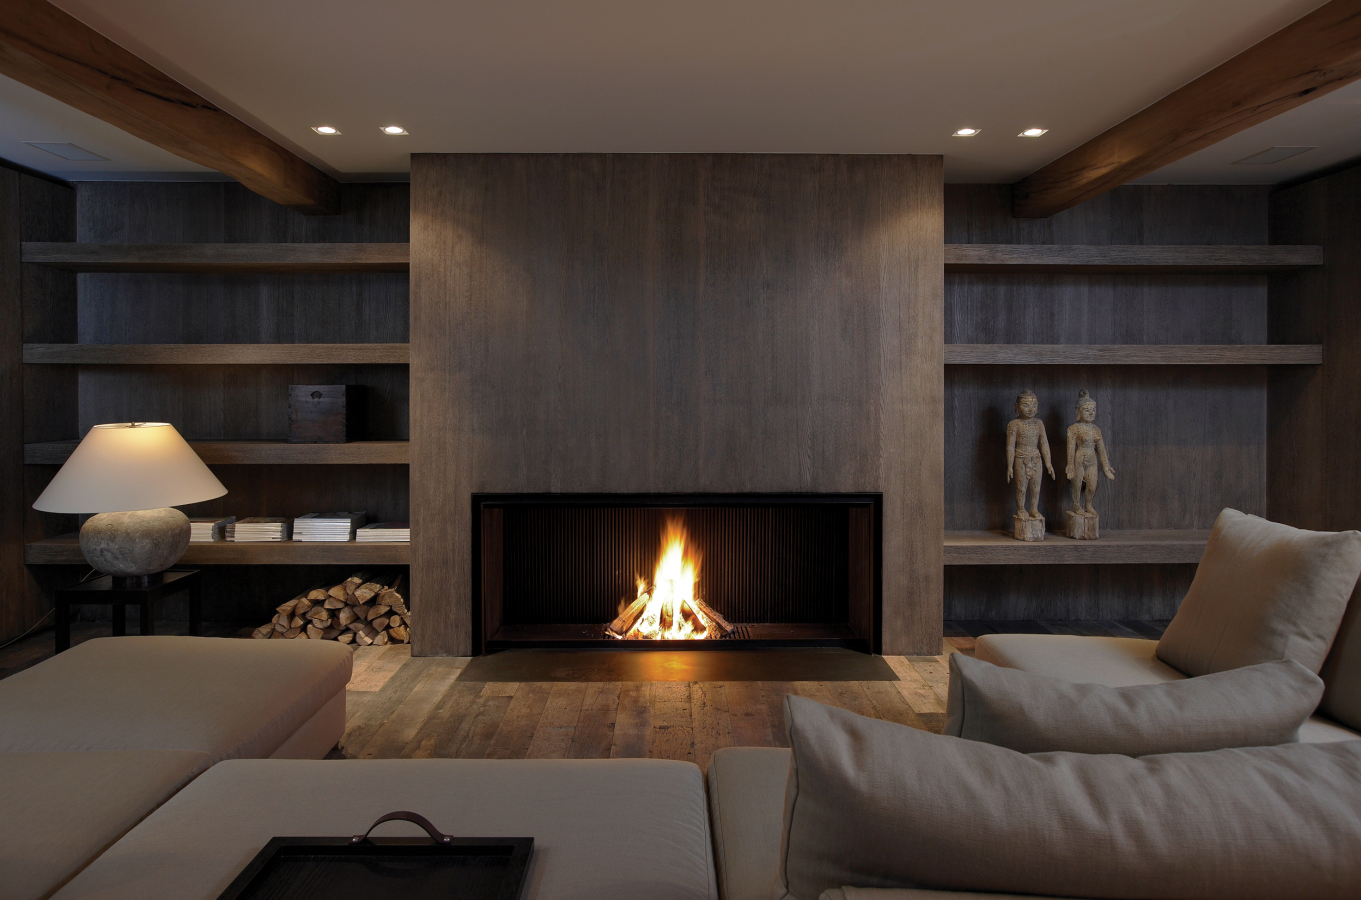 Home Et Foyer Avis : Fireplace de puydt foyer à gaz bois dream home